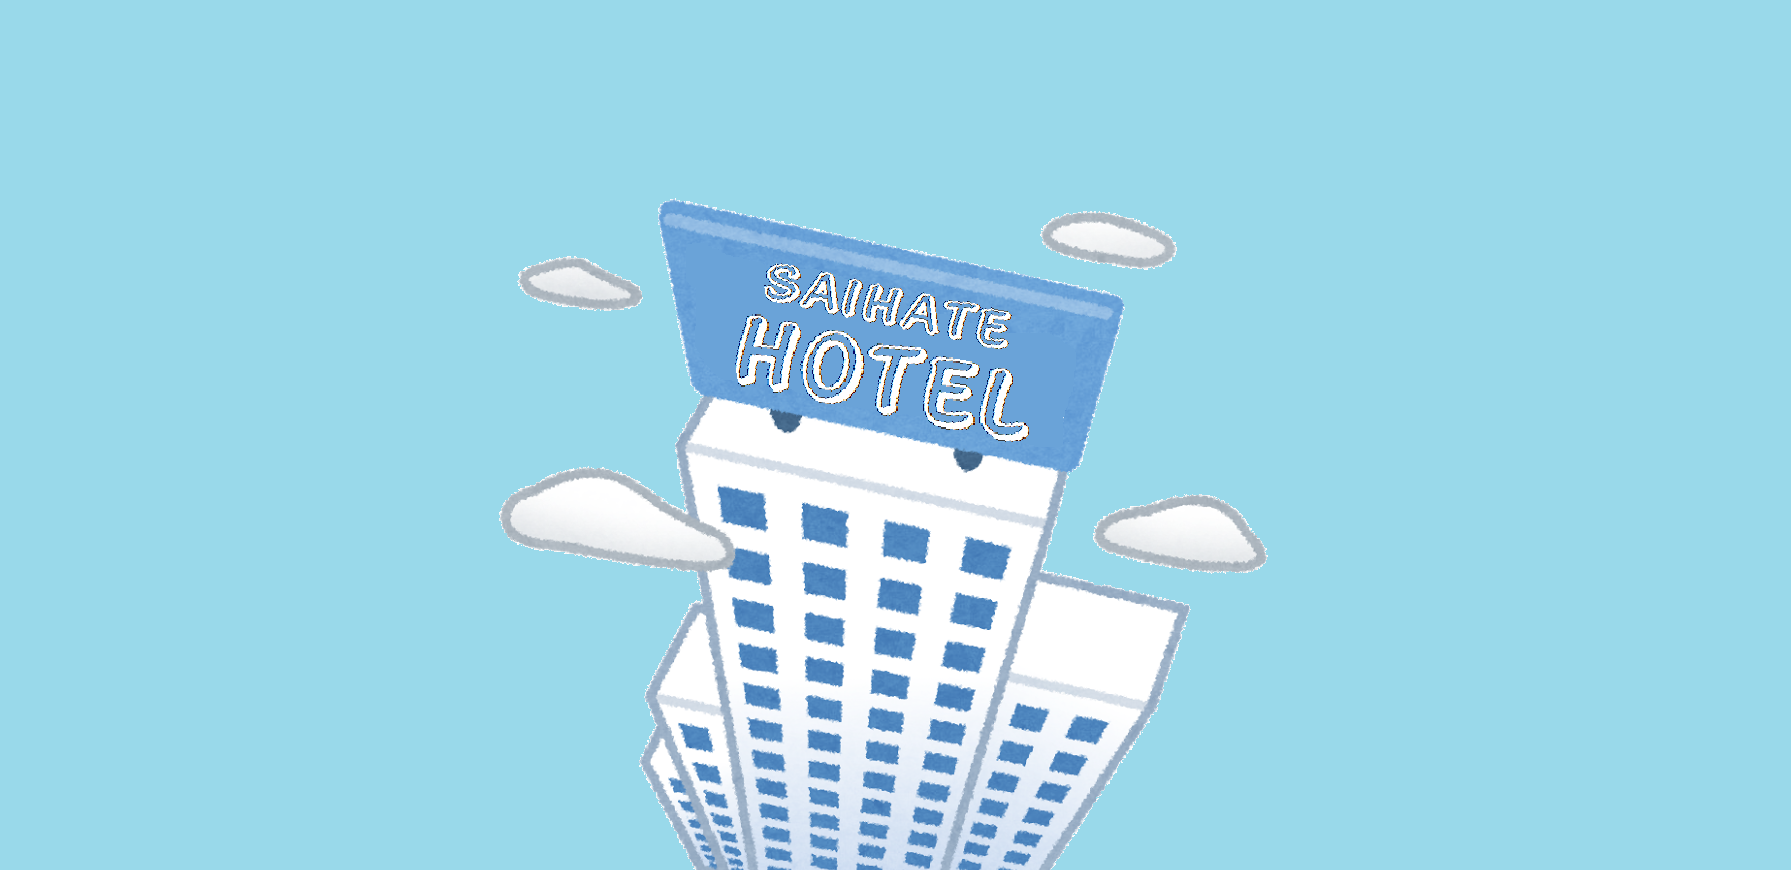 「SAIHATE HOTEL」のイメージ